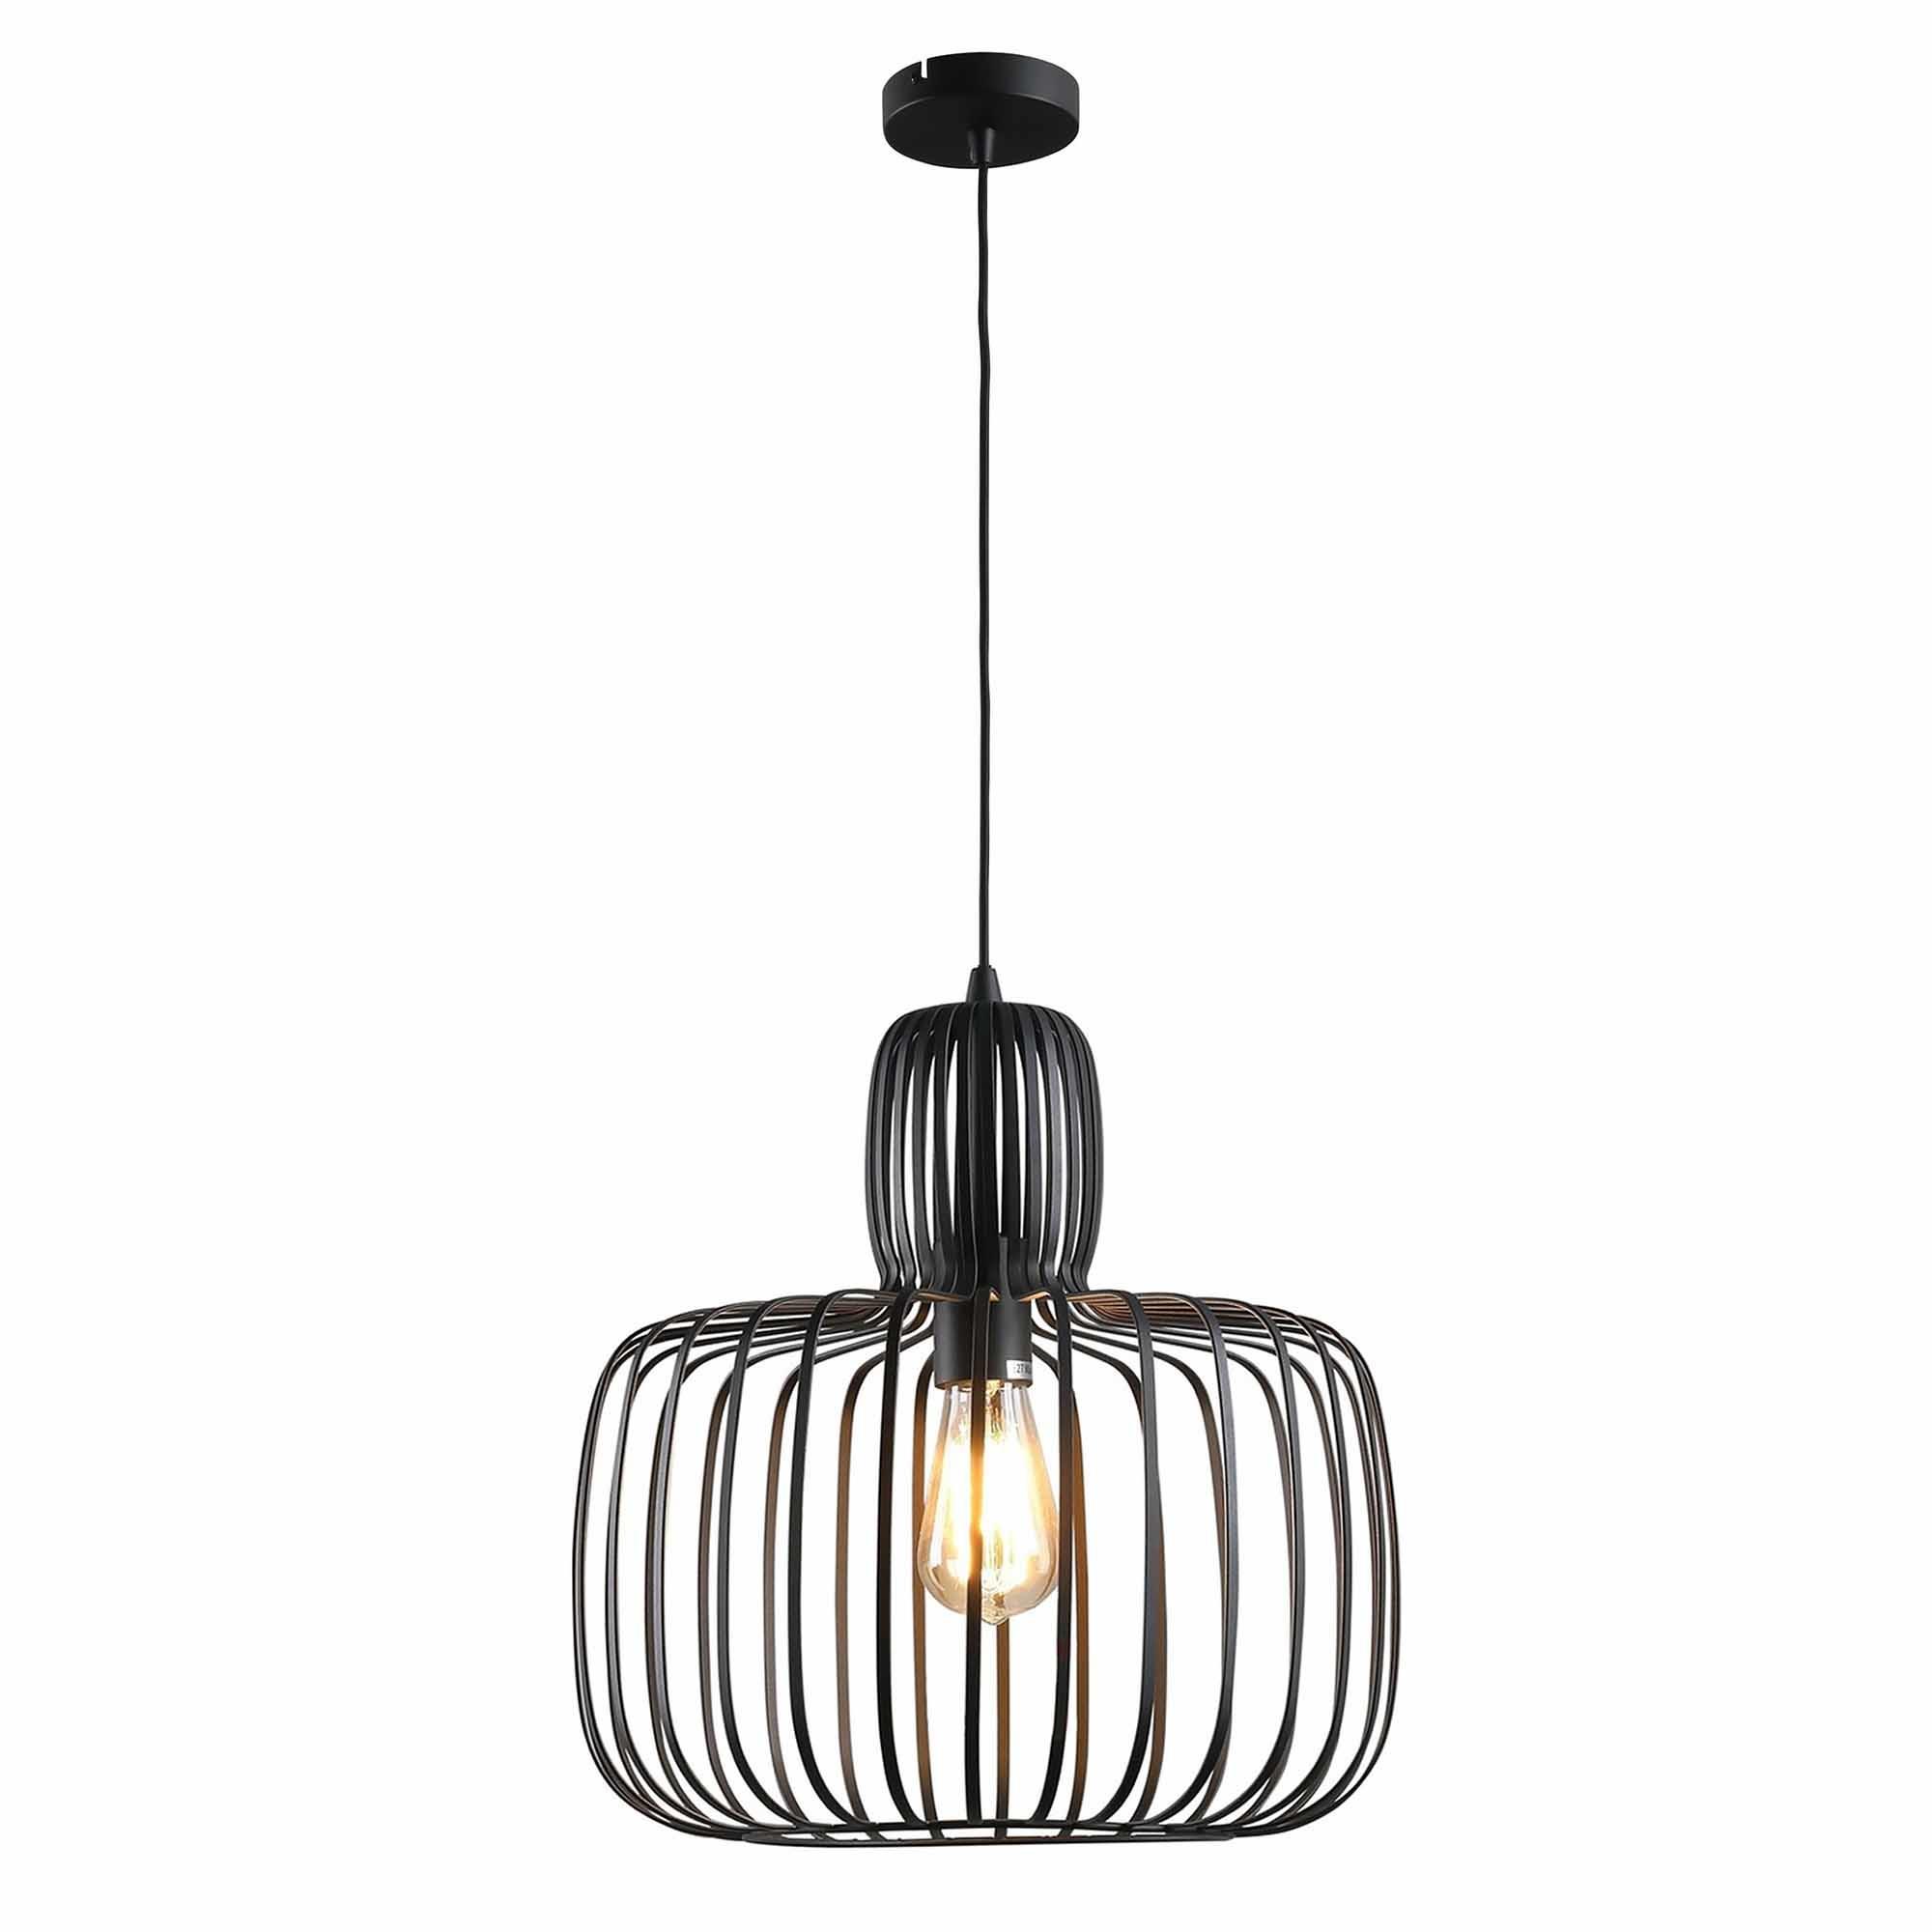 Freelight Hanglamp Costola Ø 55 cm zwart